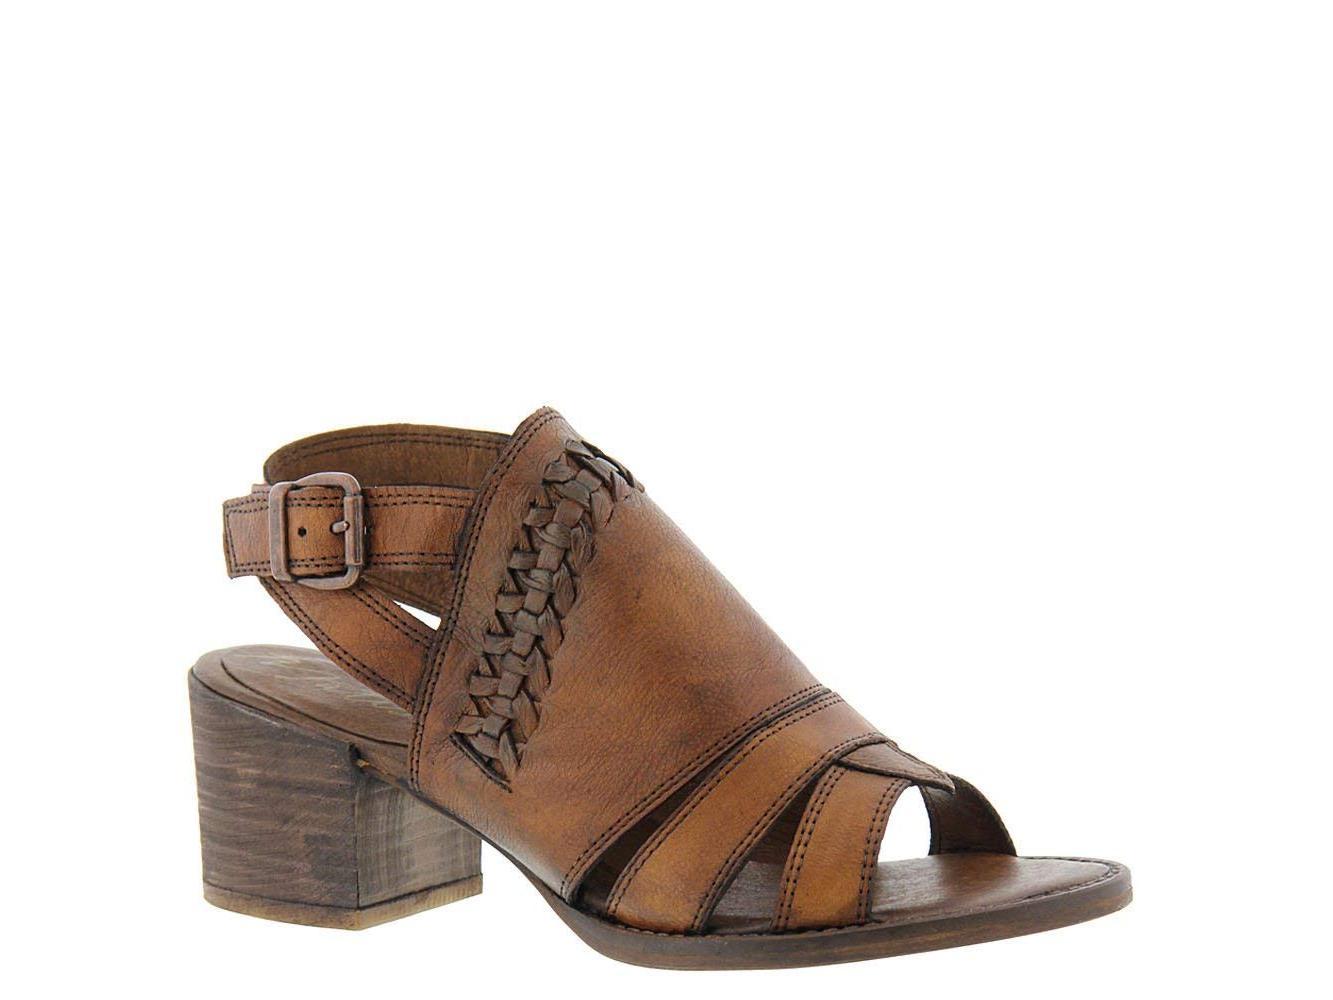 Matisse Jett Women's Sandal, Brown, Size 8.0